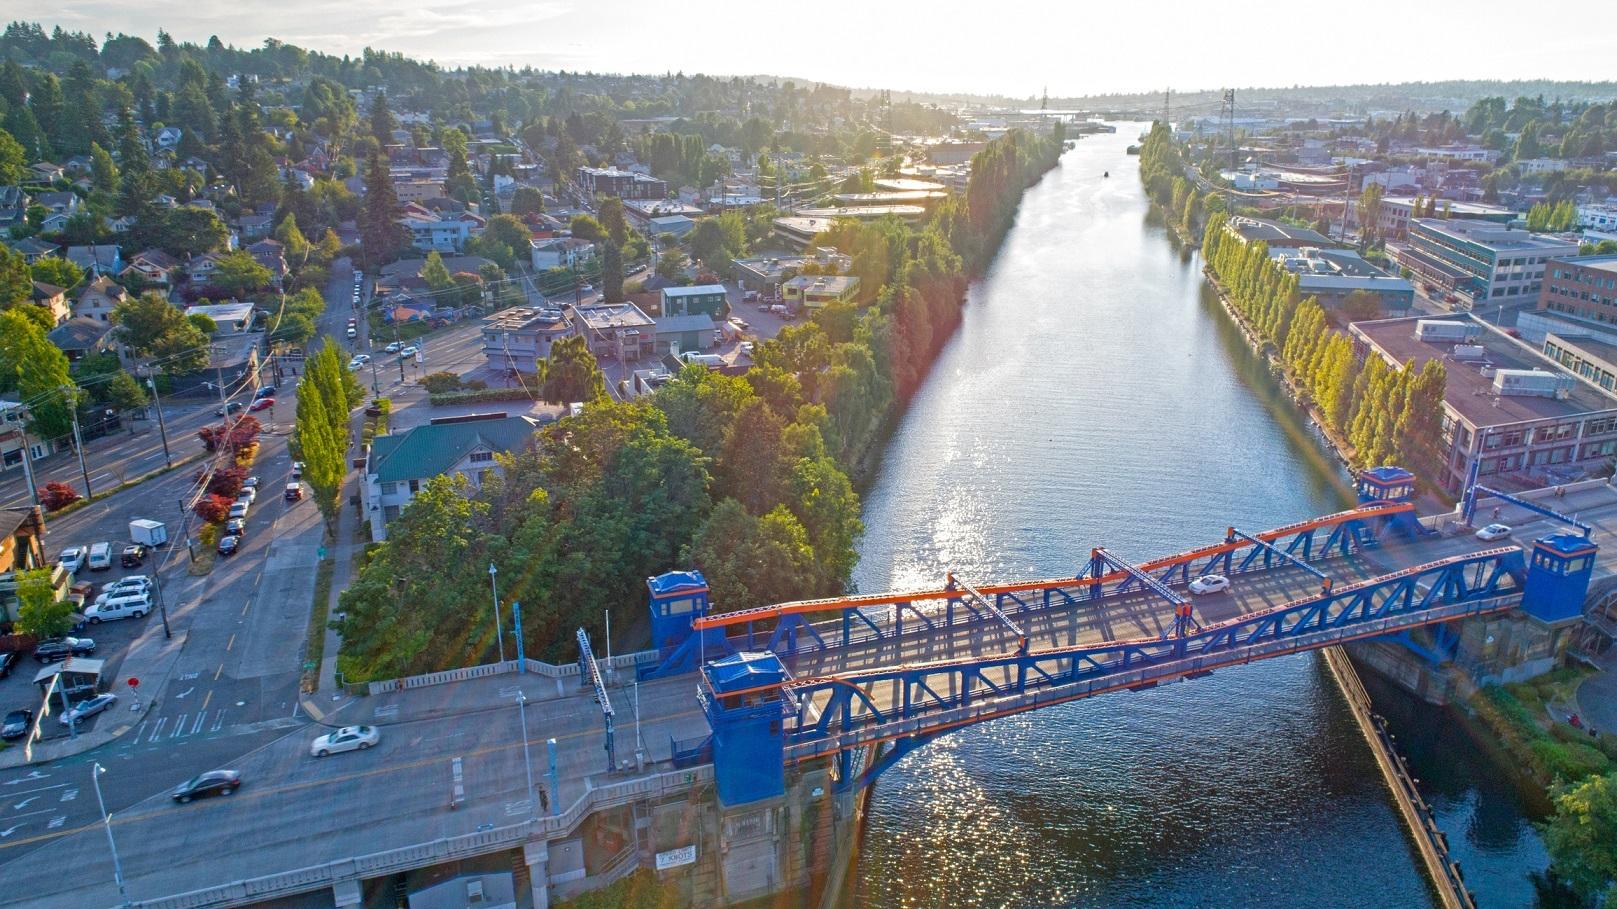 Fremont Bridge Seattle Lake Washington Ship Canal Magnolia Neighborhood Aerial